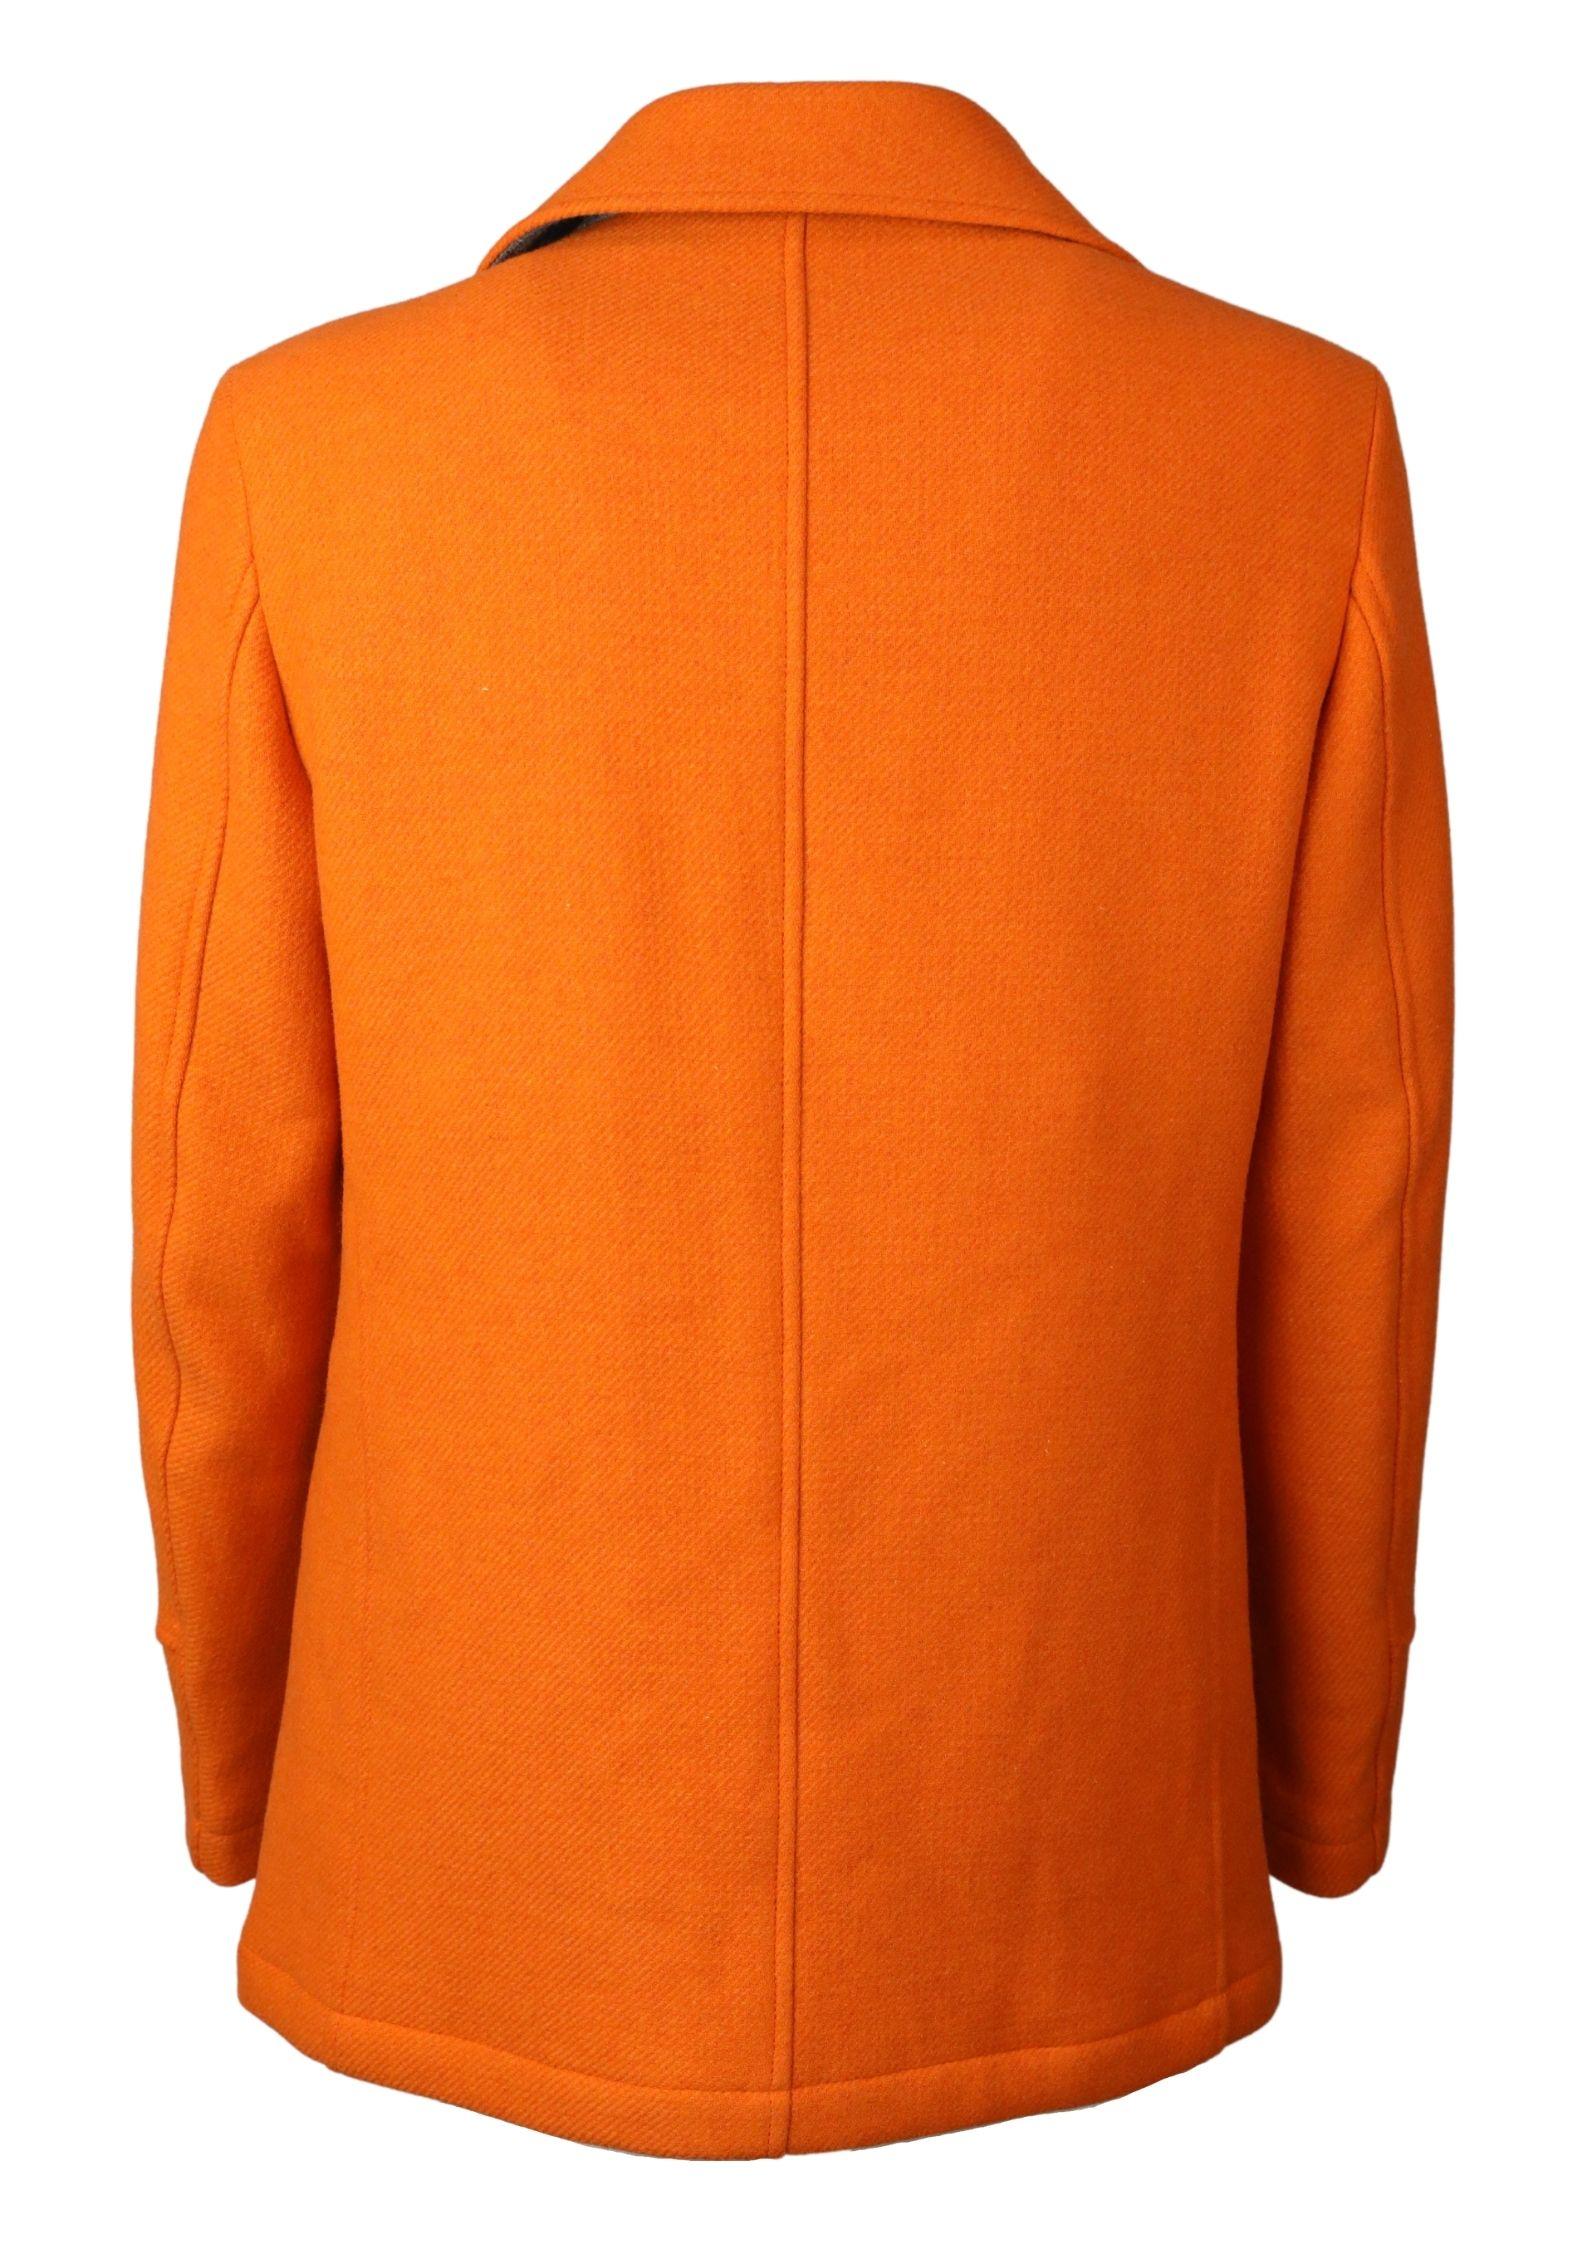 Doubl-breasted jacket CAMPLIN   Jackets   ISLANDZA S